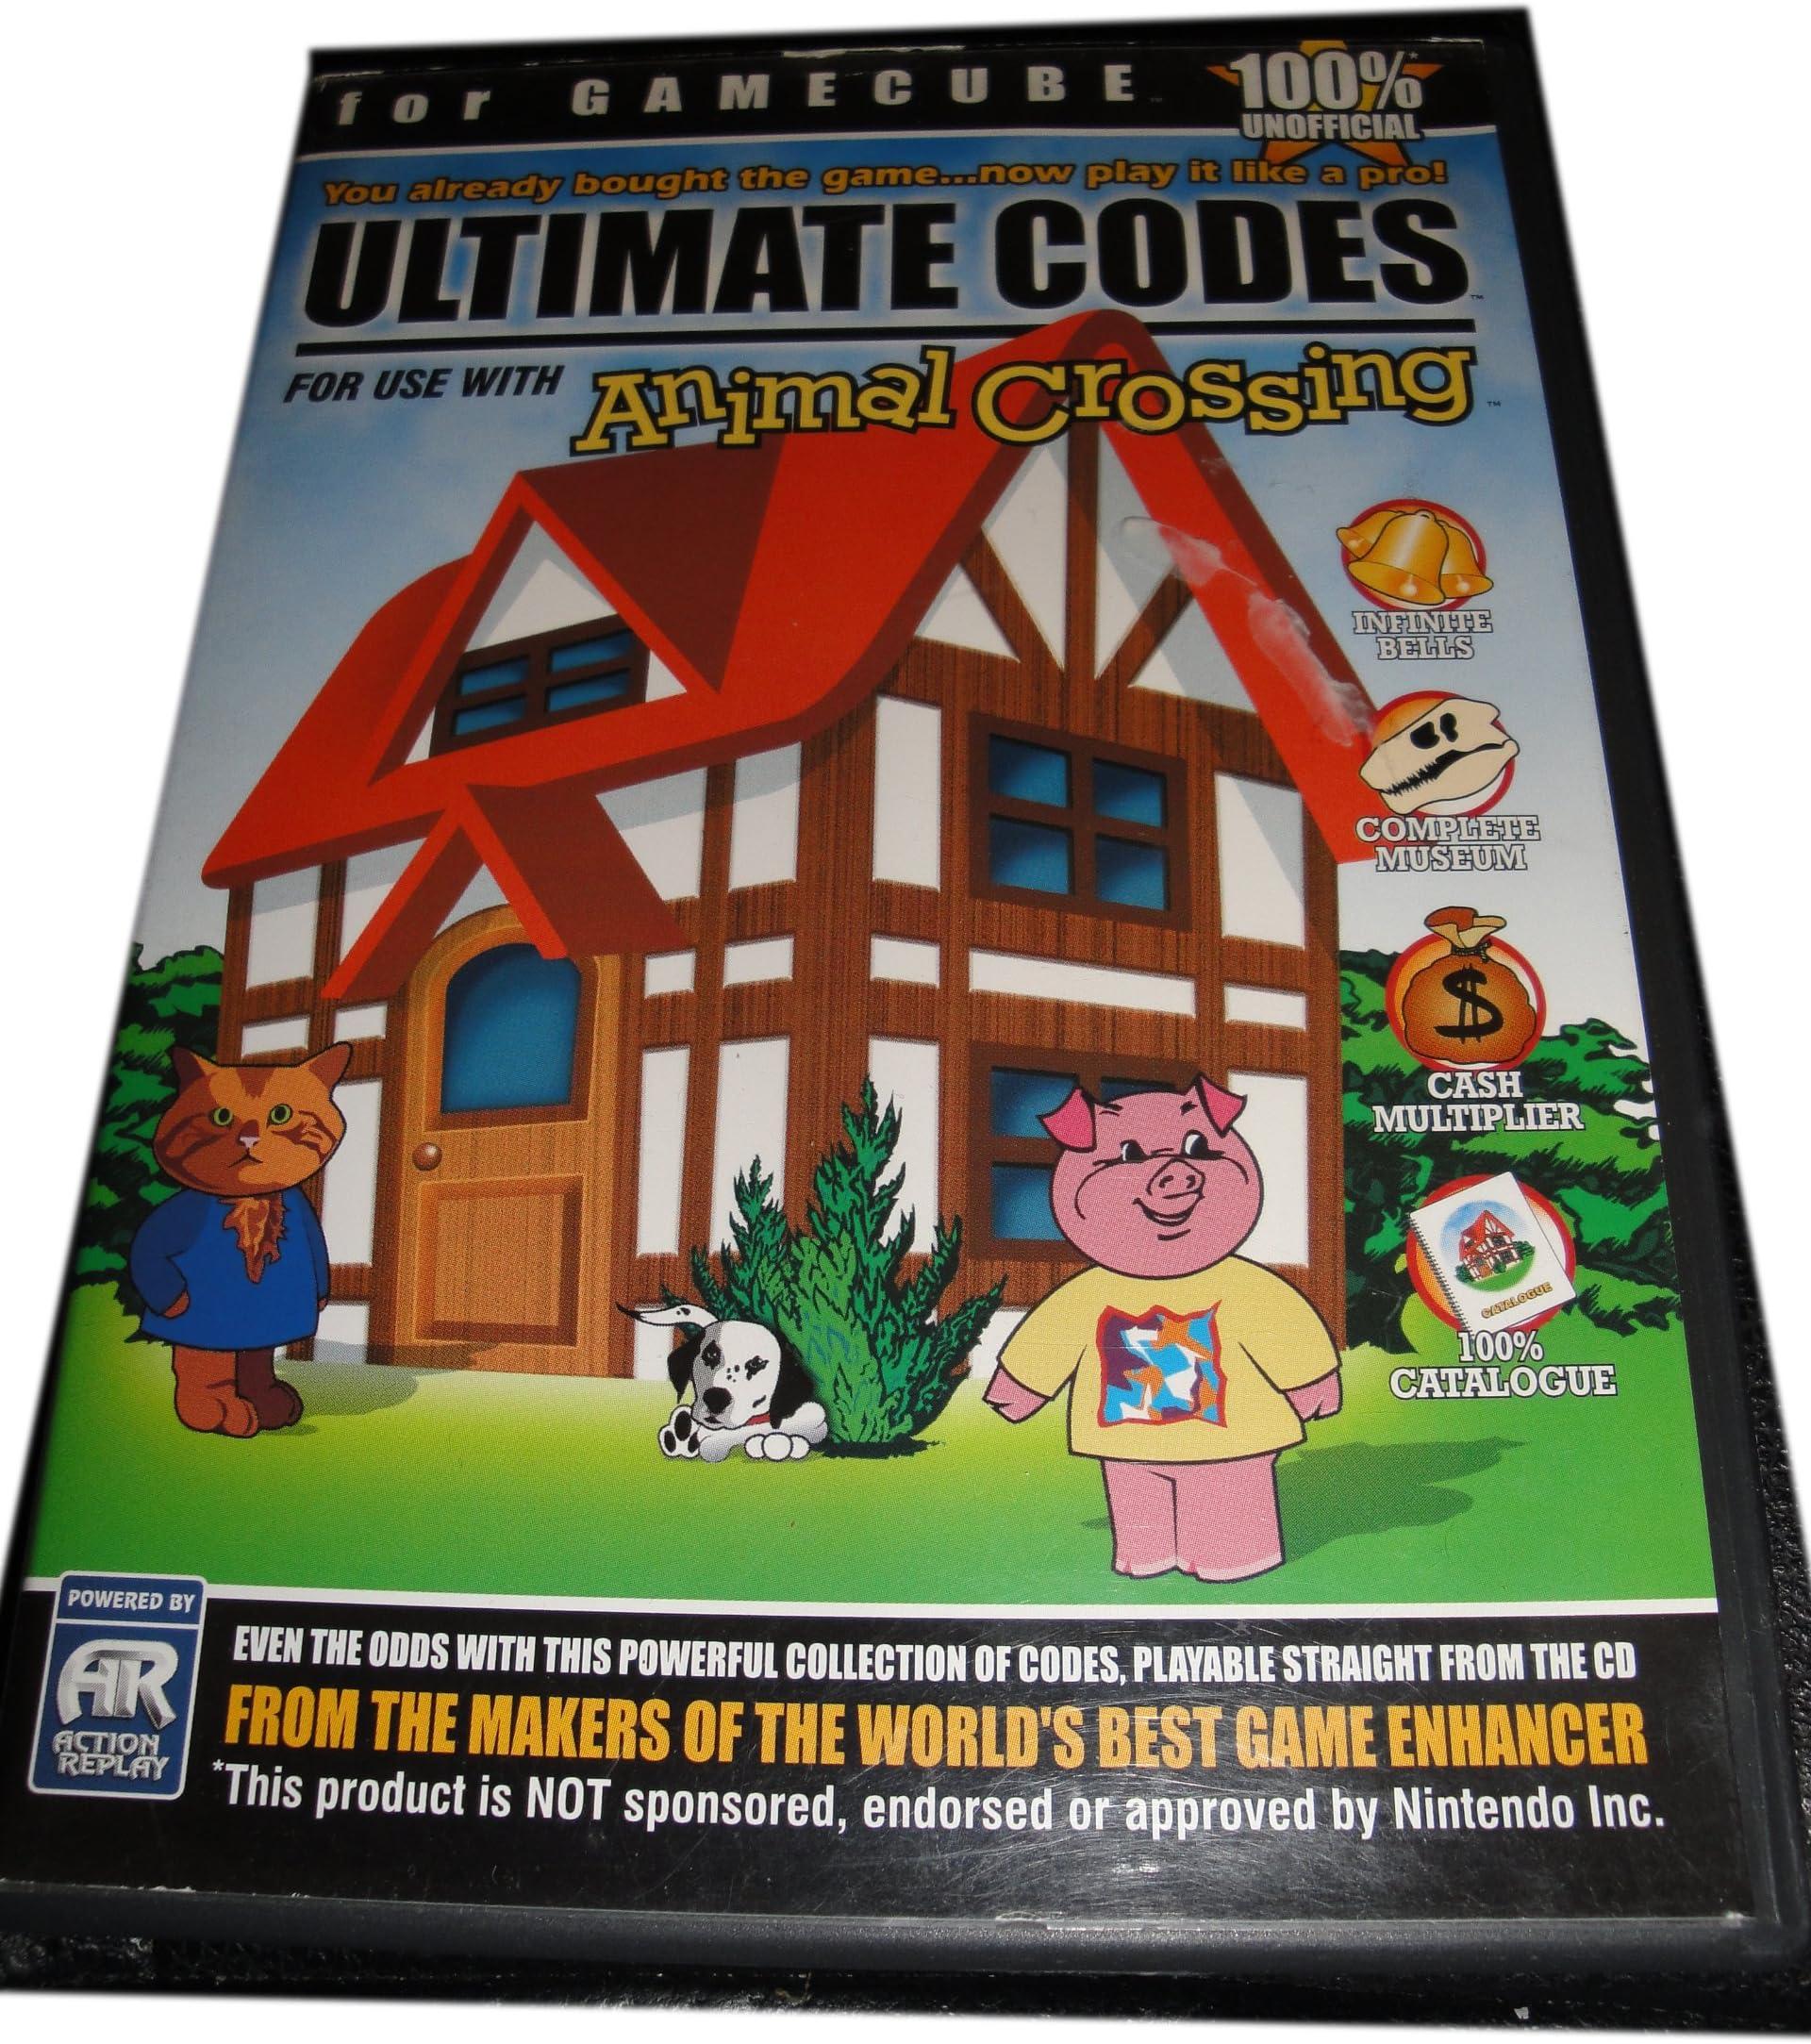 Amazon.com: Ultimate <b>Codes</b>- <b>Animal Crossing</b>: Video Games